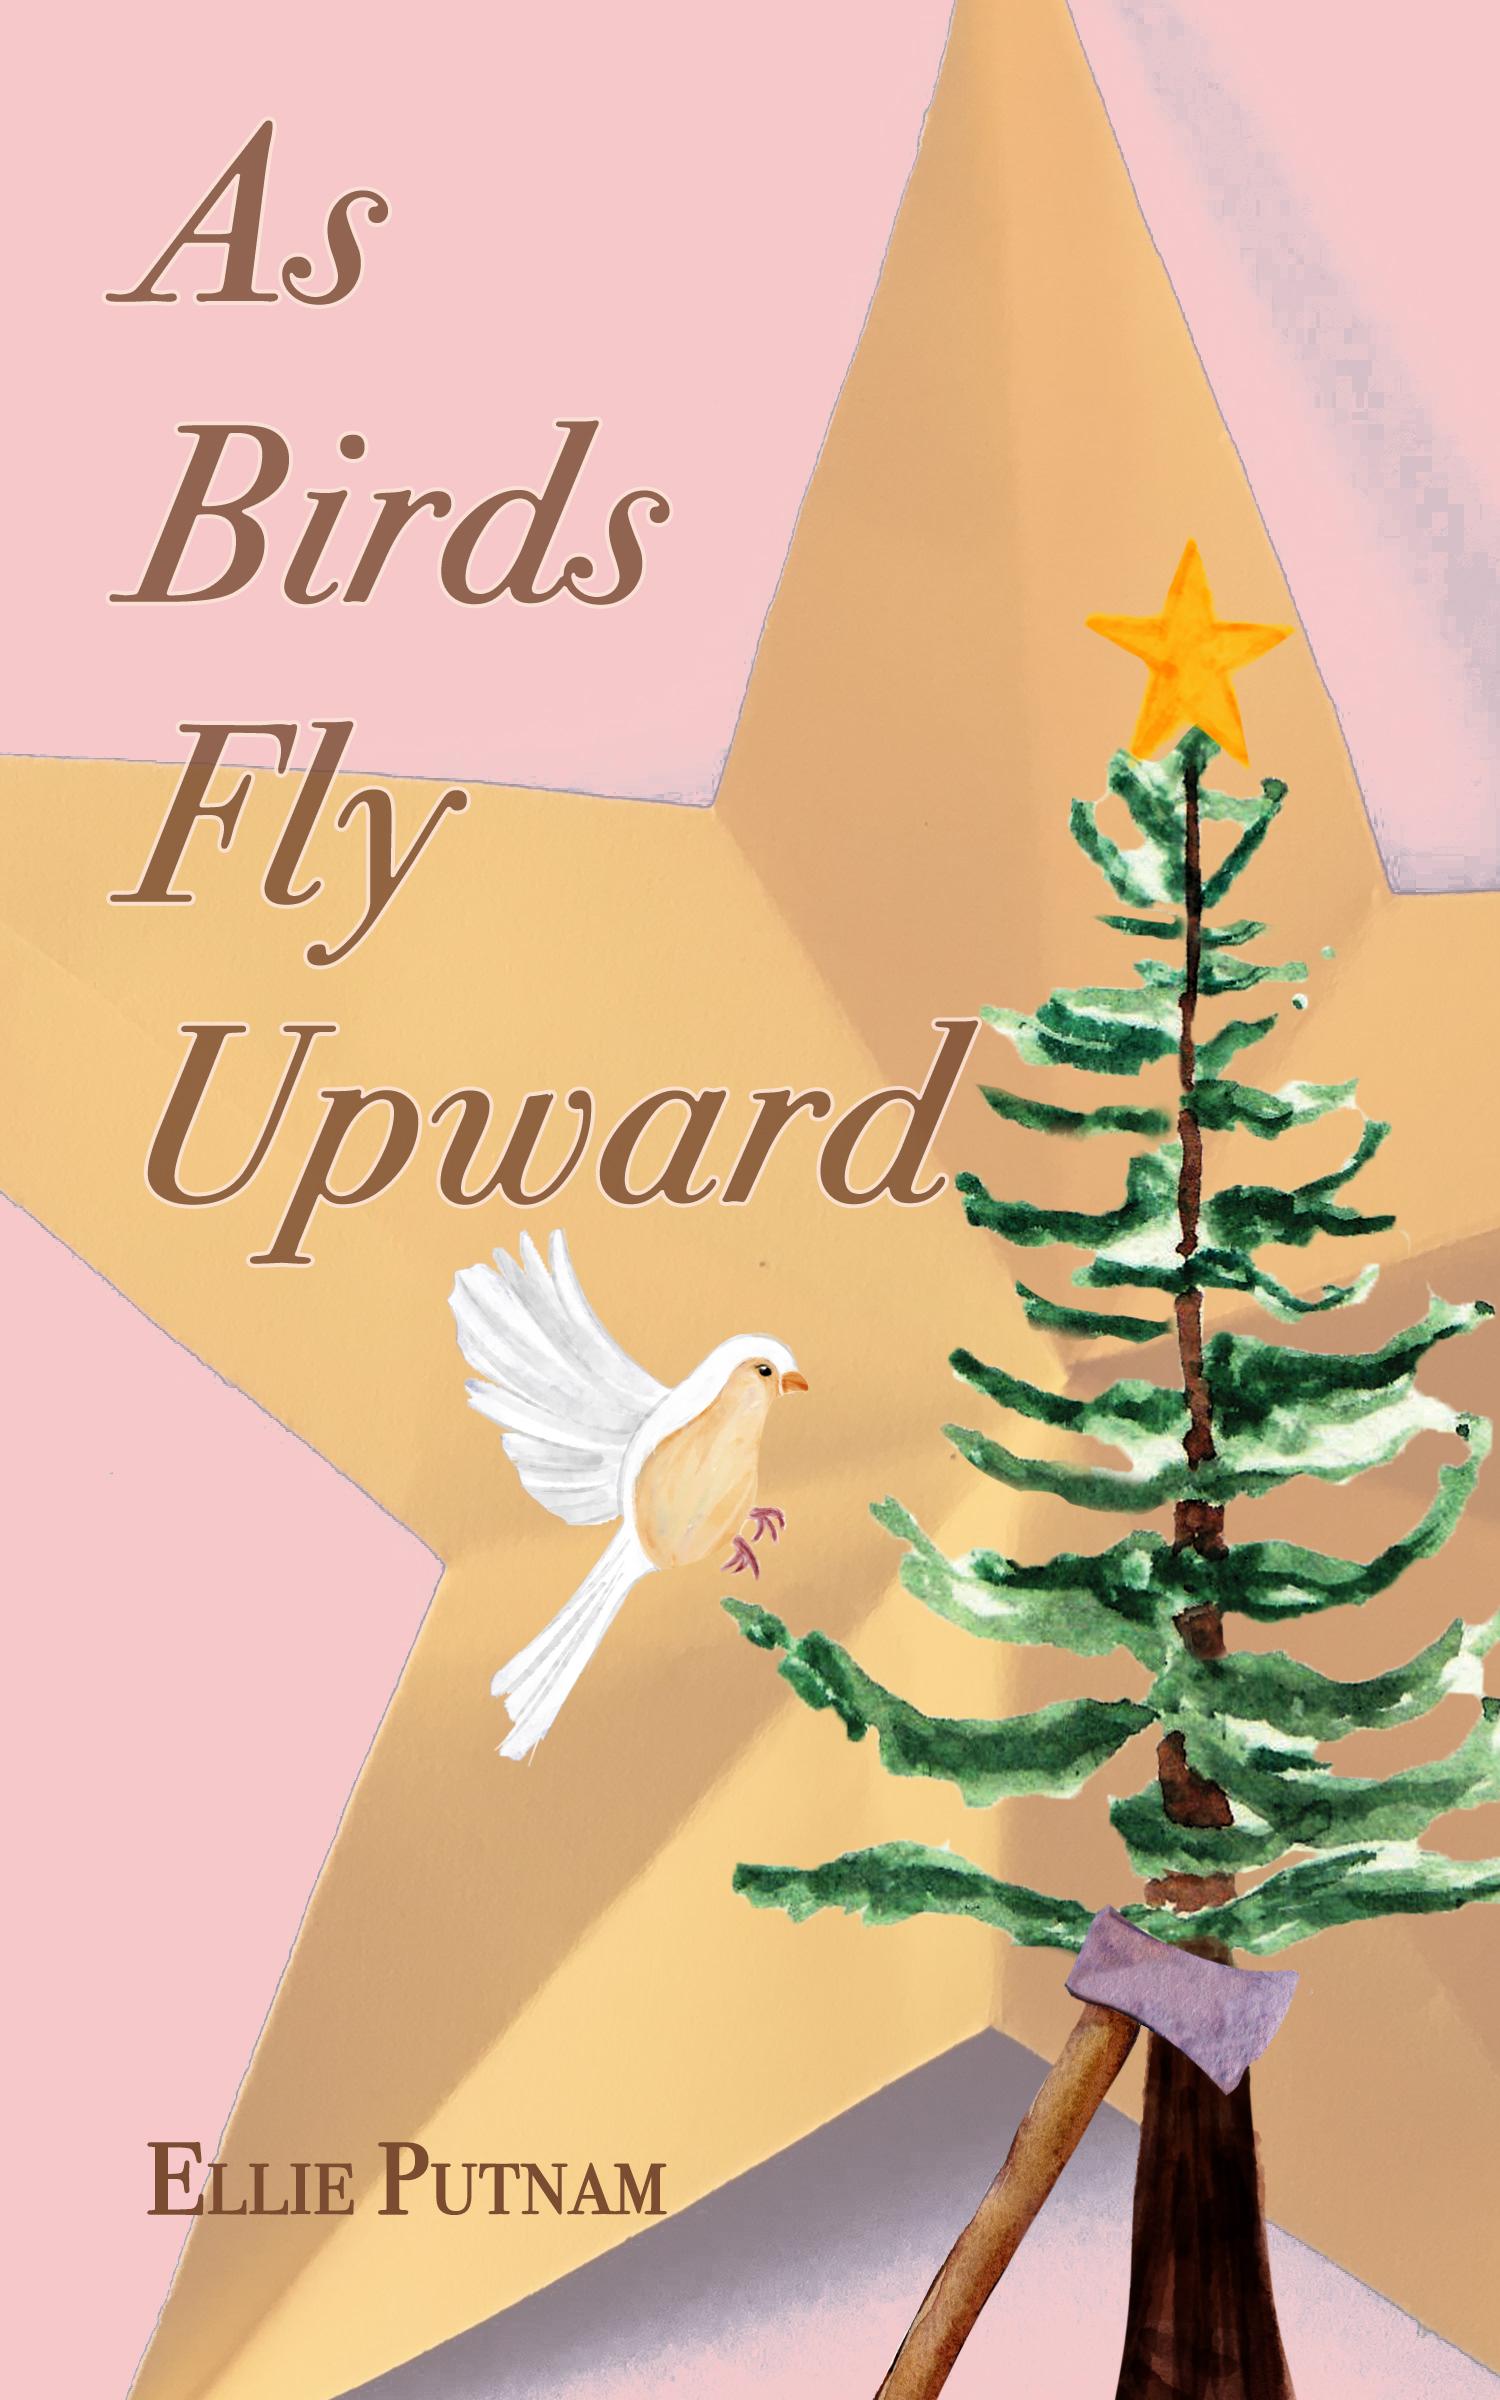 Thank you for reading. - As Birds Fly Upward is Ellie Putnam's debut novel.